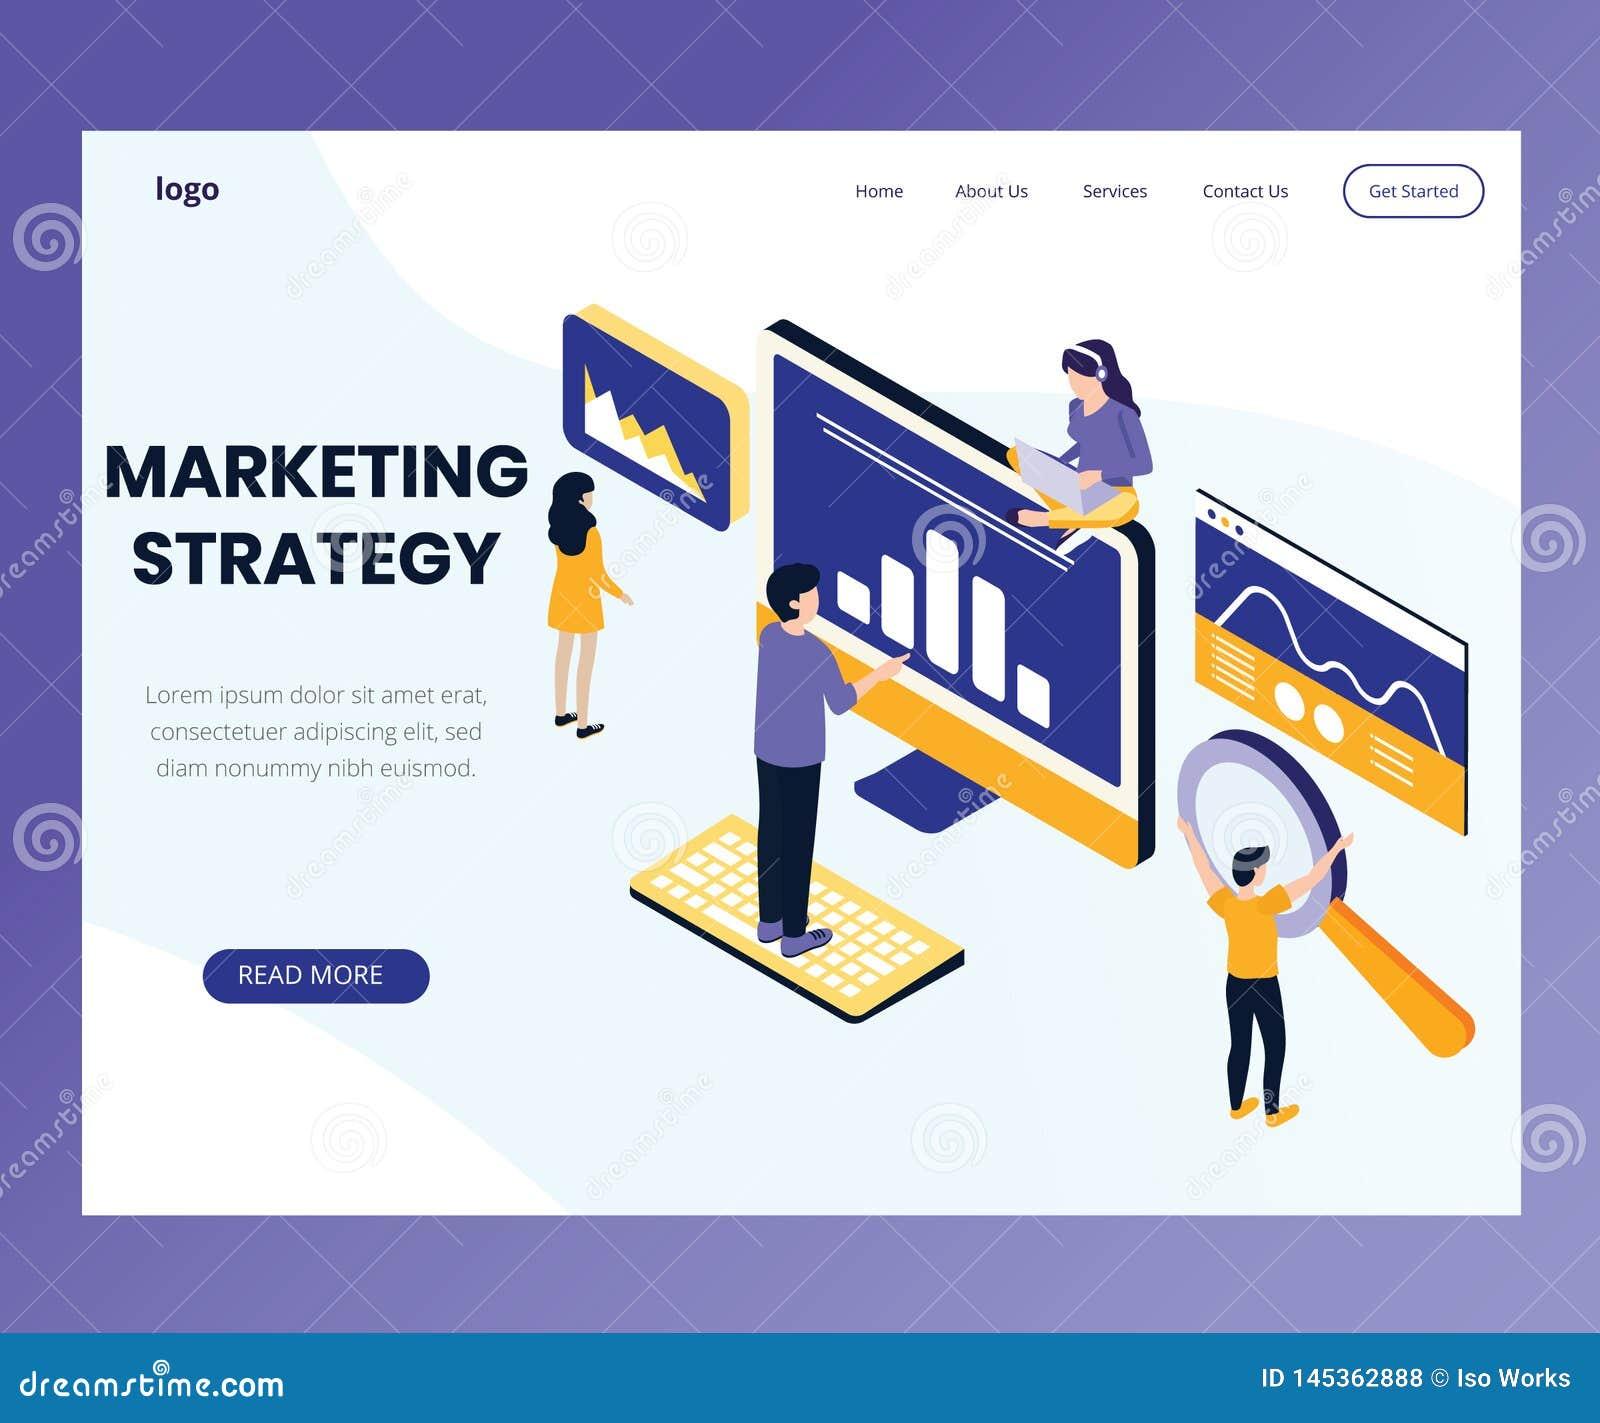 Marketingstrategieentwurf, wo Leute isometrisches Grafik-Konzept bearbeiten